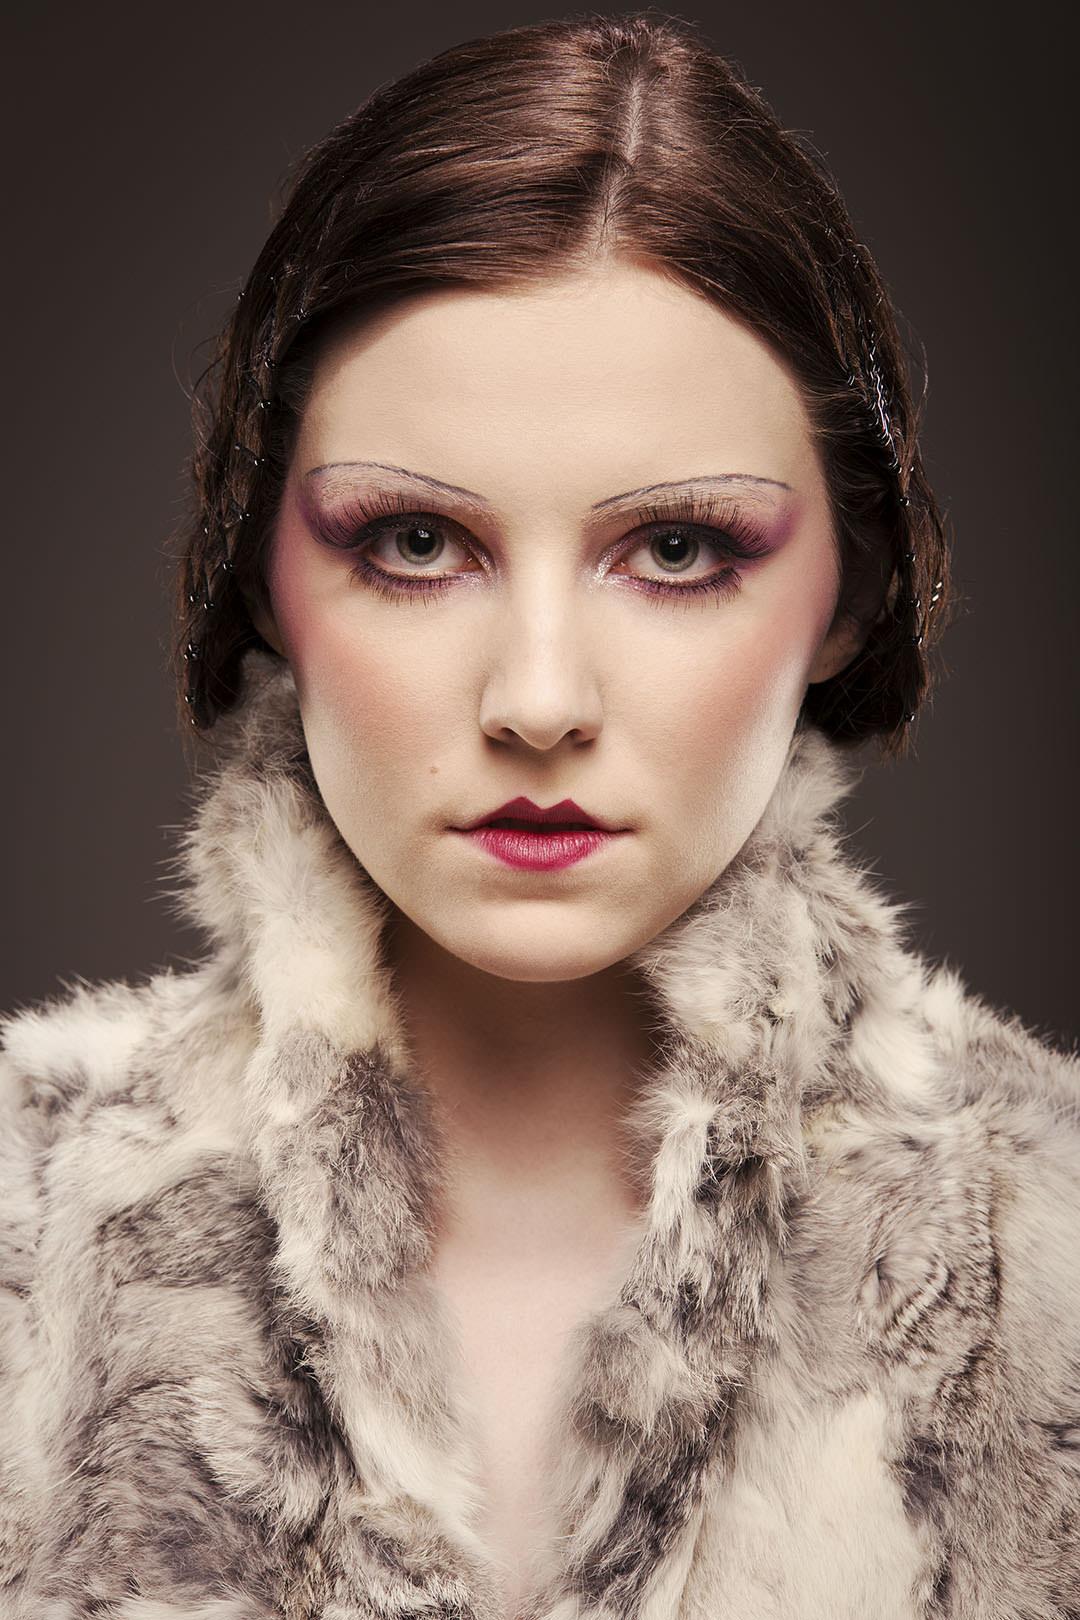 Magdalena_Dziadkowiak-Stefaniak_make_up_01